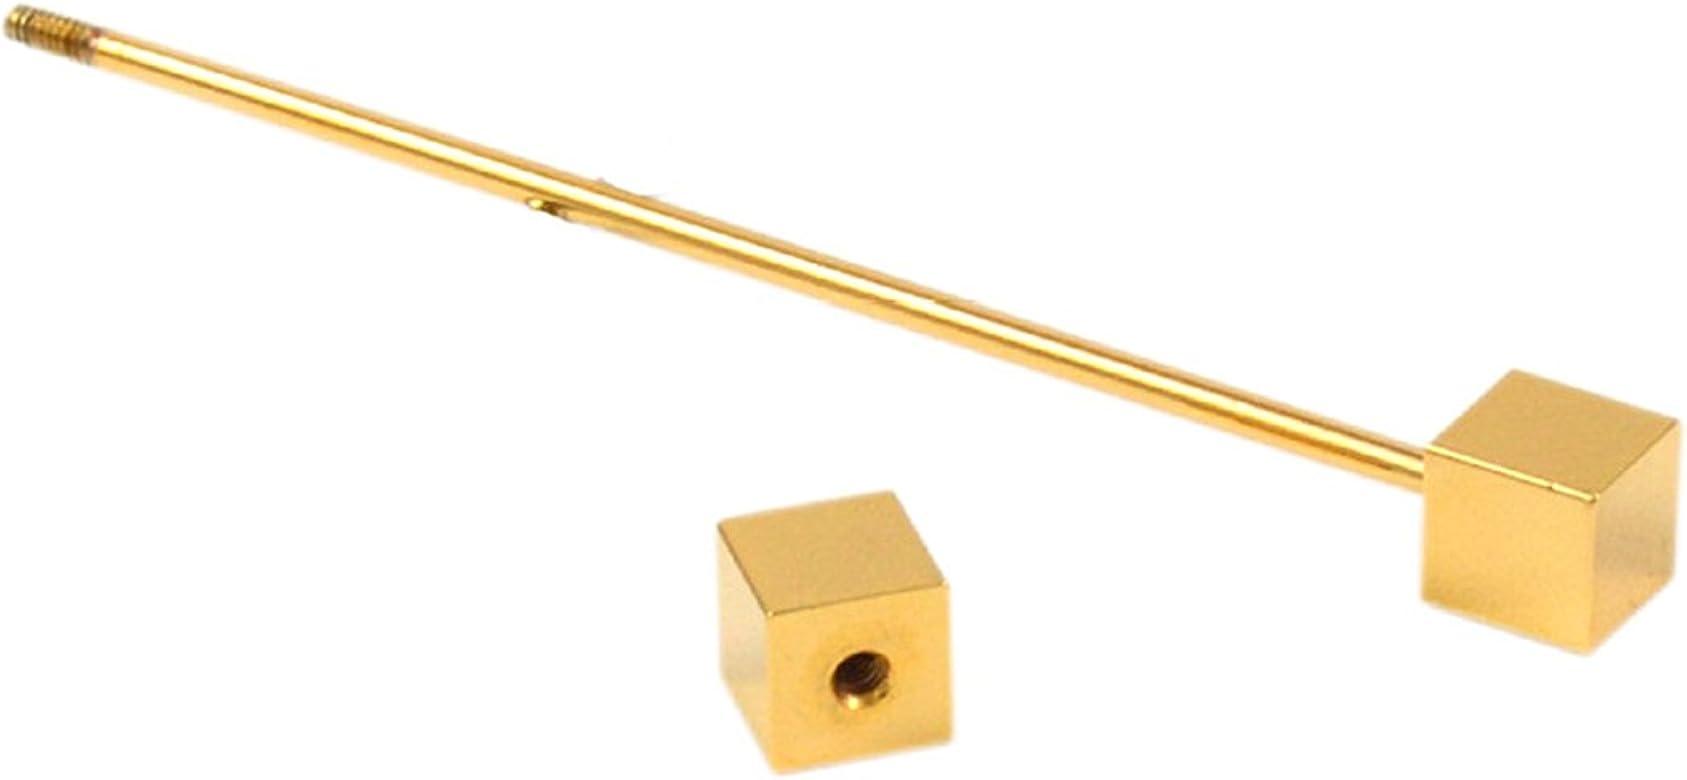 Epinki Hombre Oro Cubo Collar Pin Bar Pin Camisa Corbata Pin ...